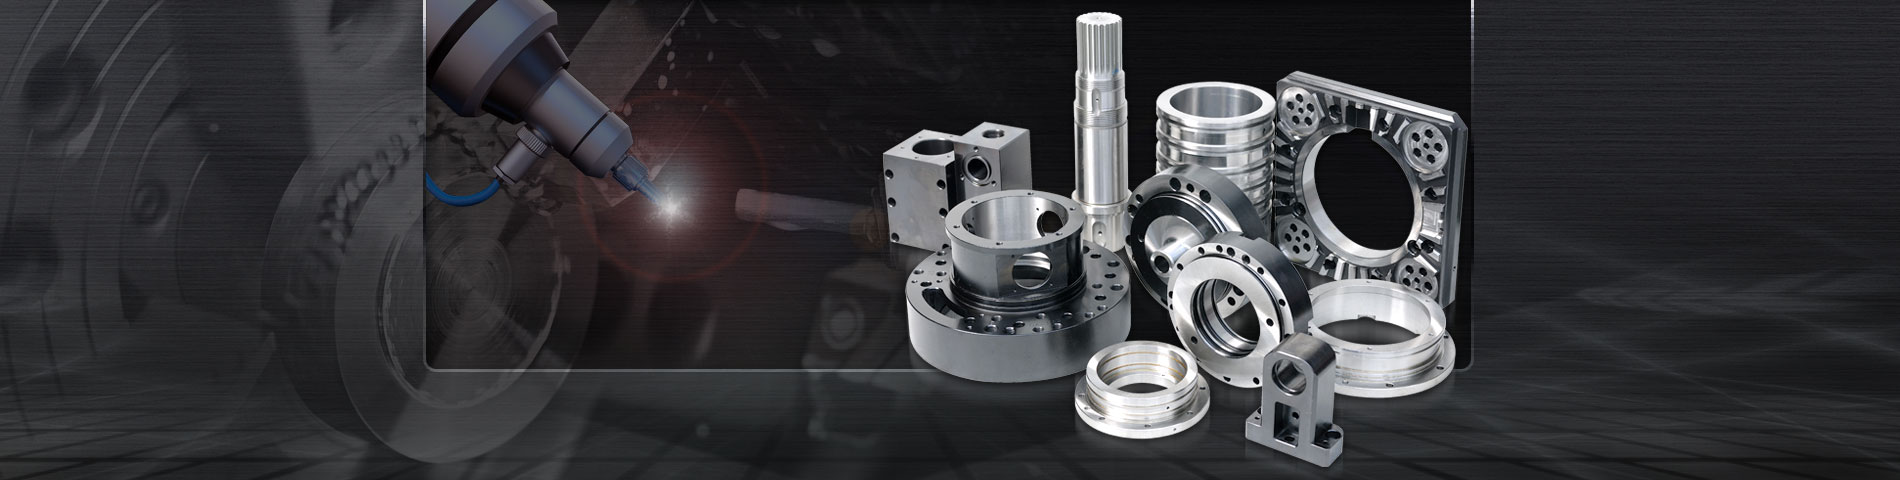 OEM Precision Machining Services